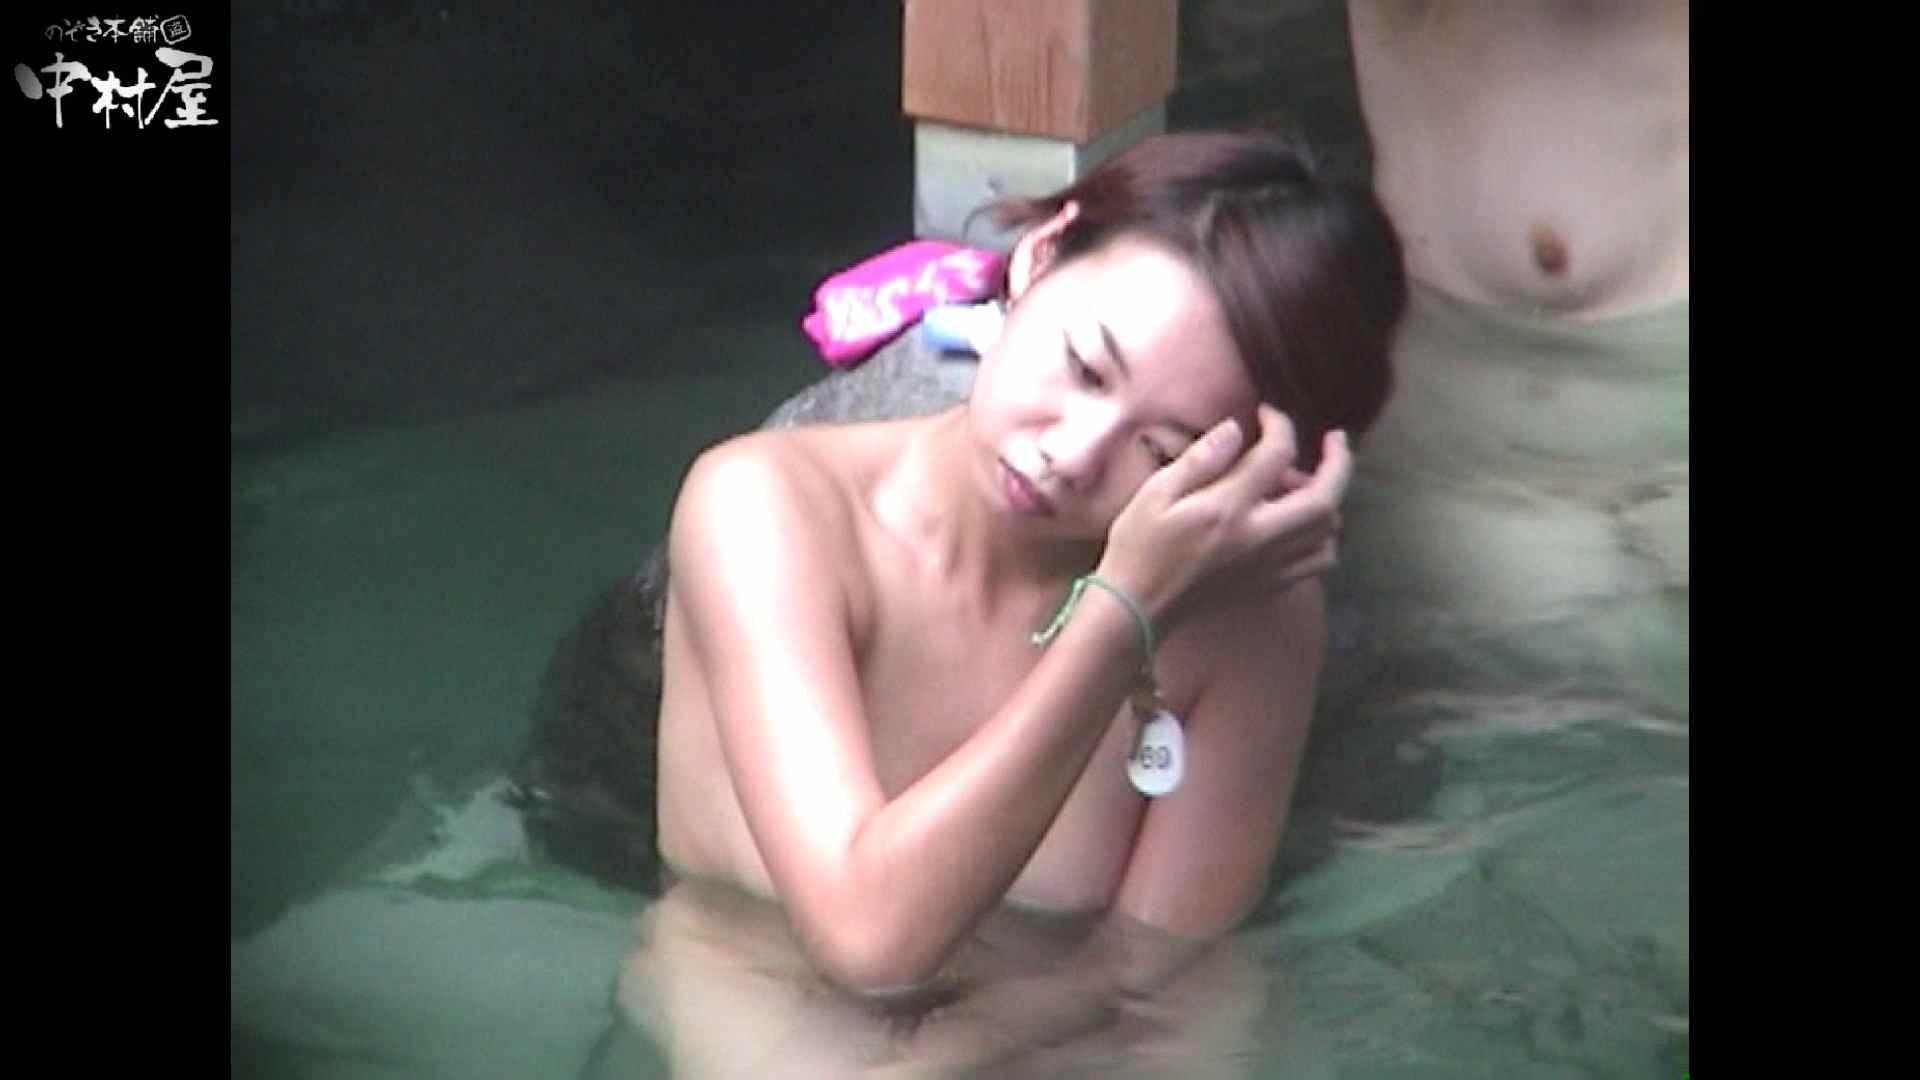 Aquaな露天風呂Vol.951 盗撮師作品 | 露天風呂突入  96pic 94